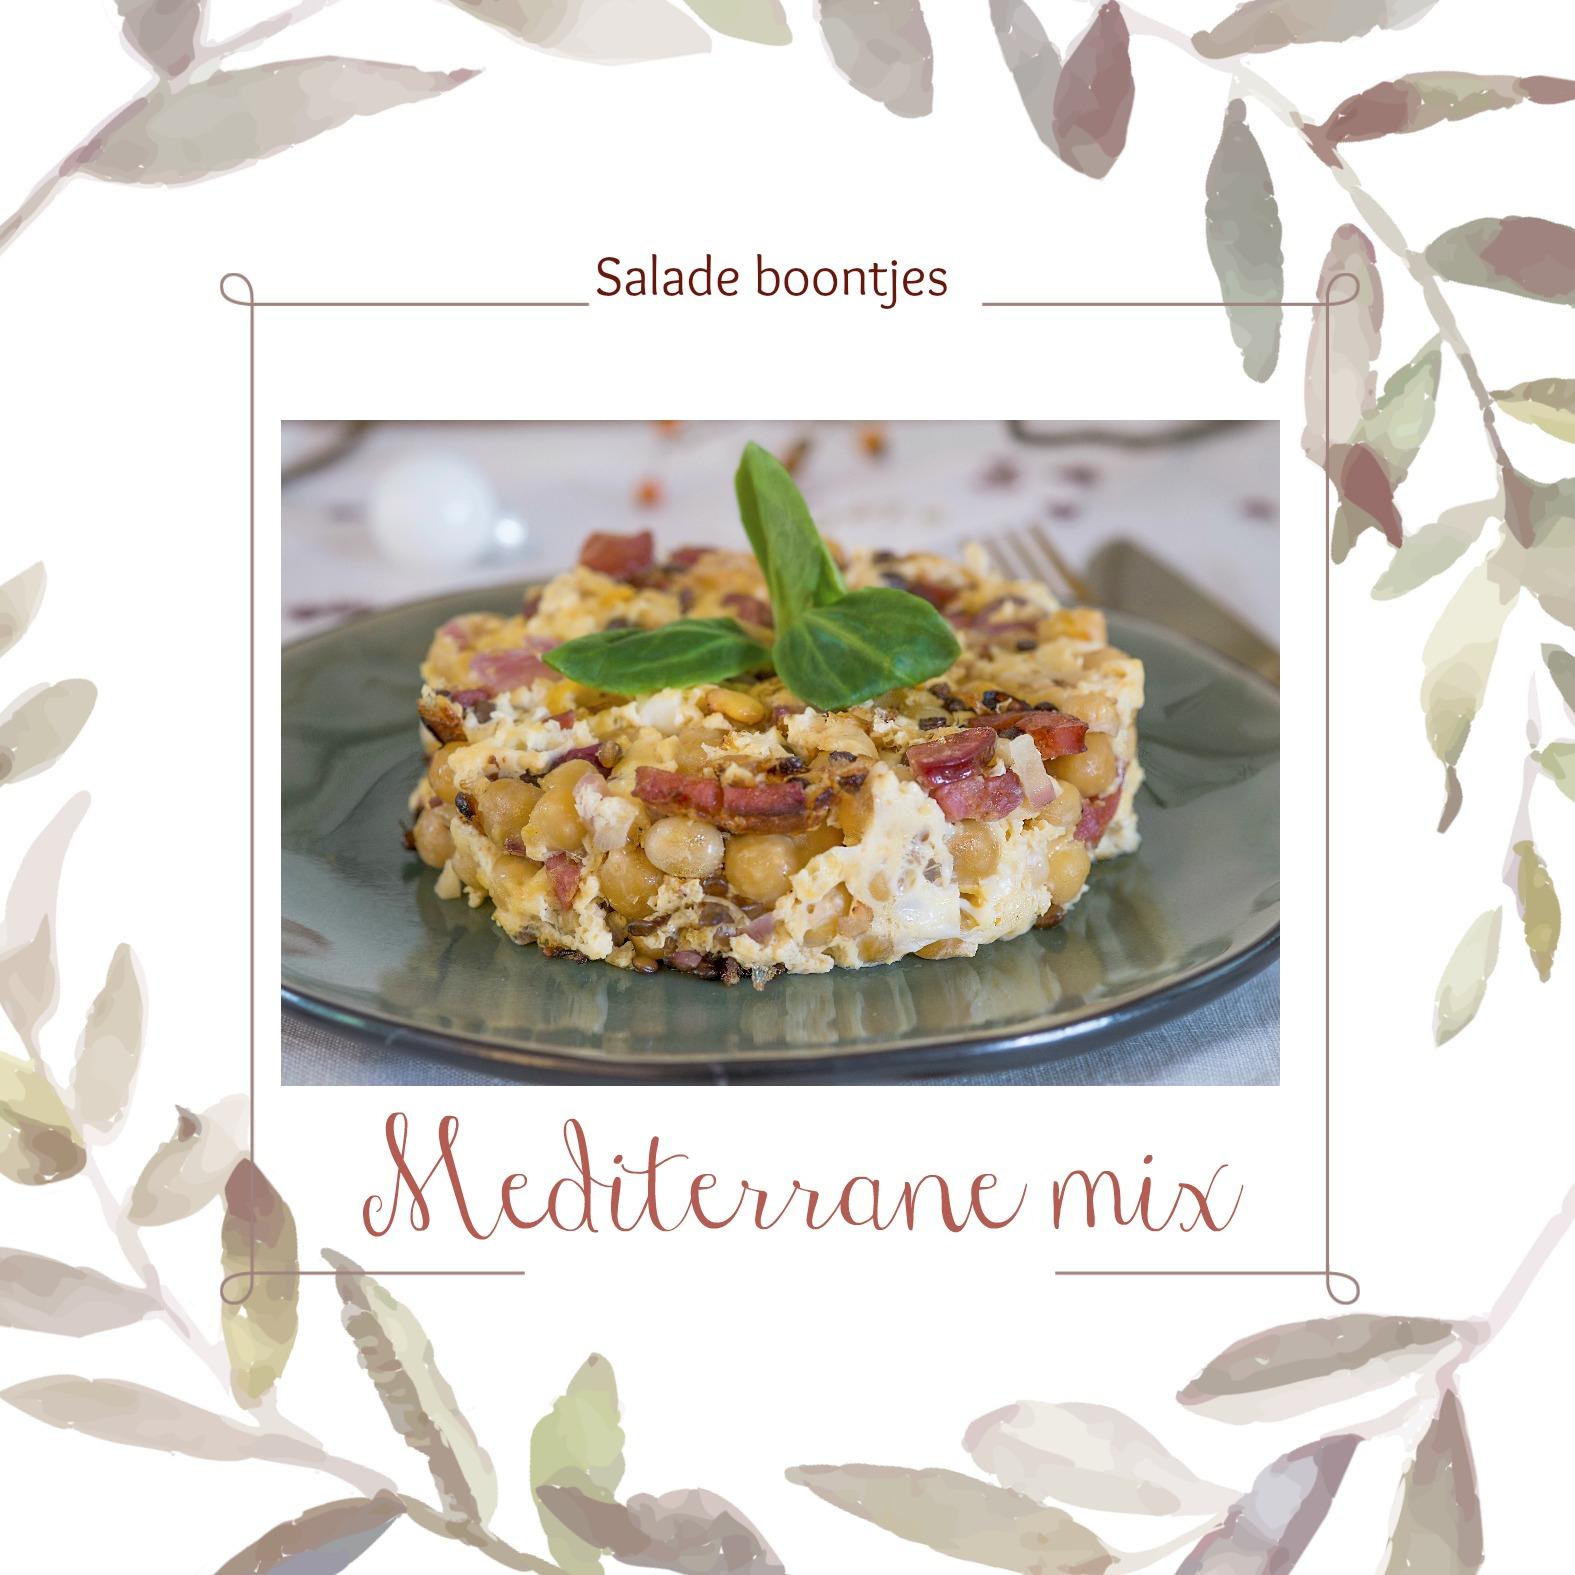 Salade boontjes, Mediterrane mix als voorgerecht